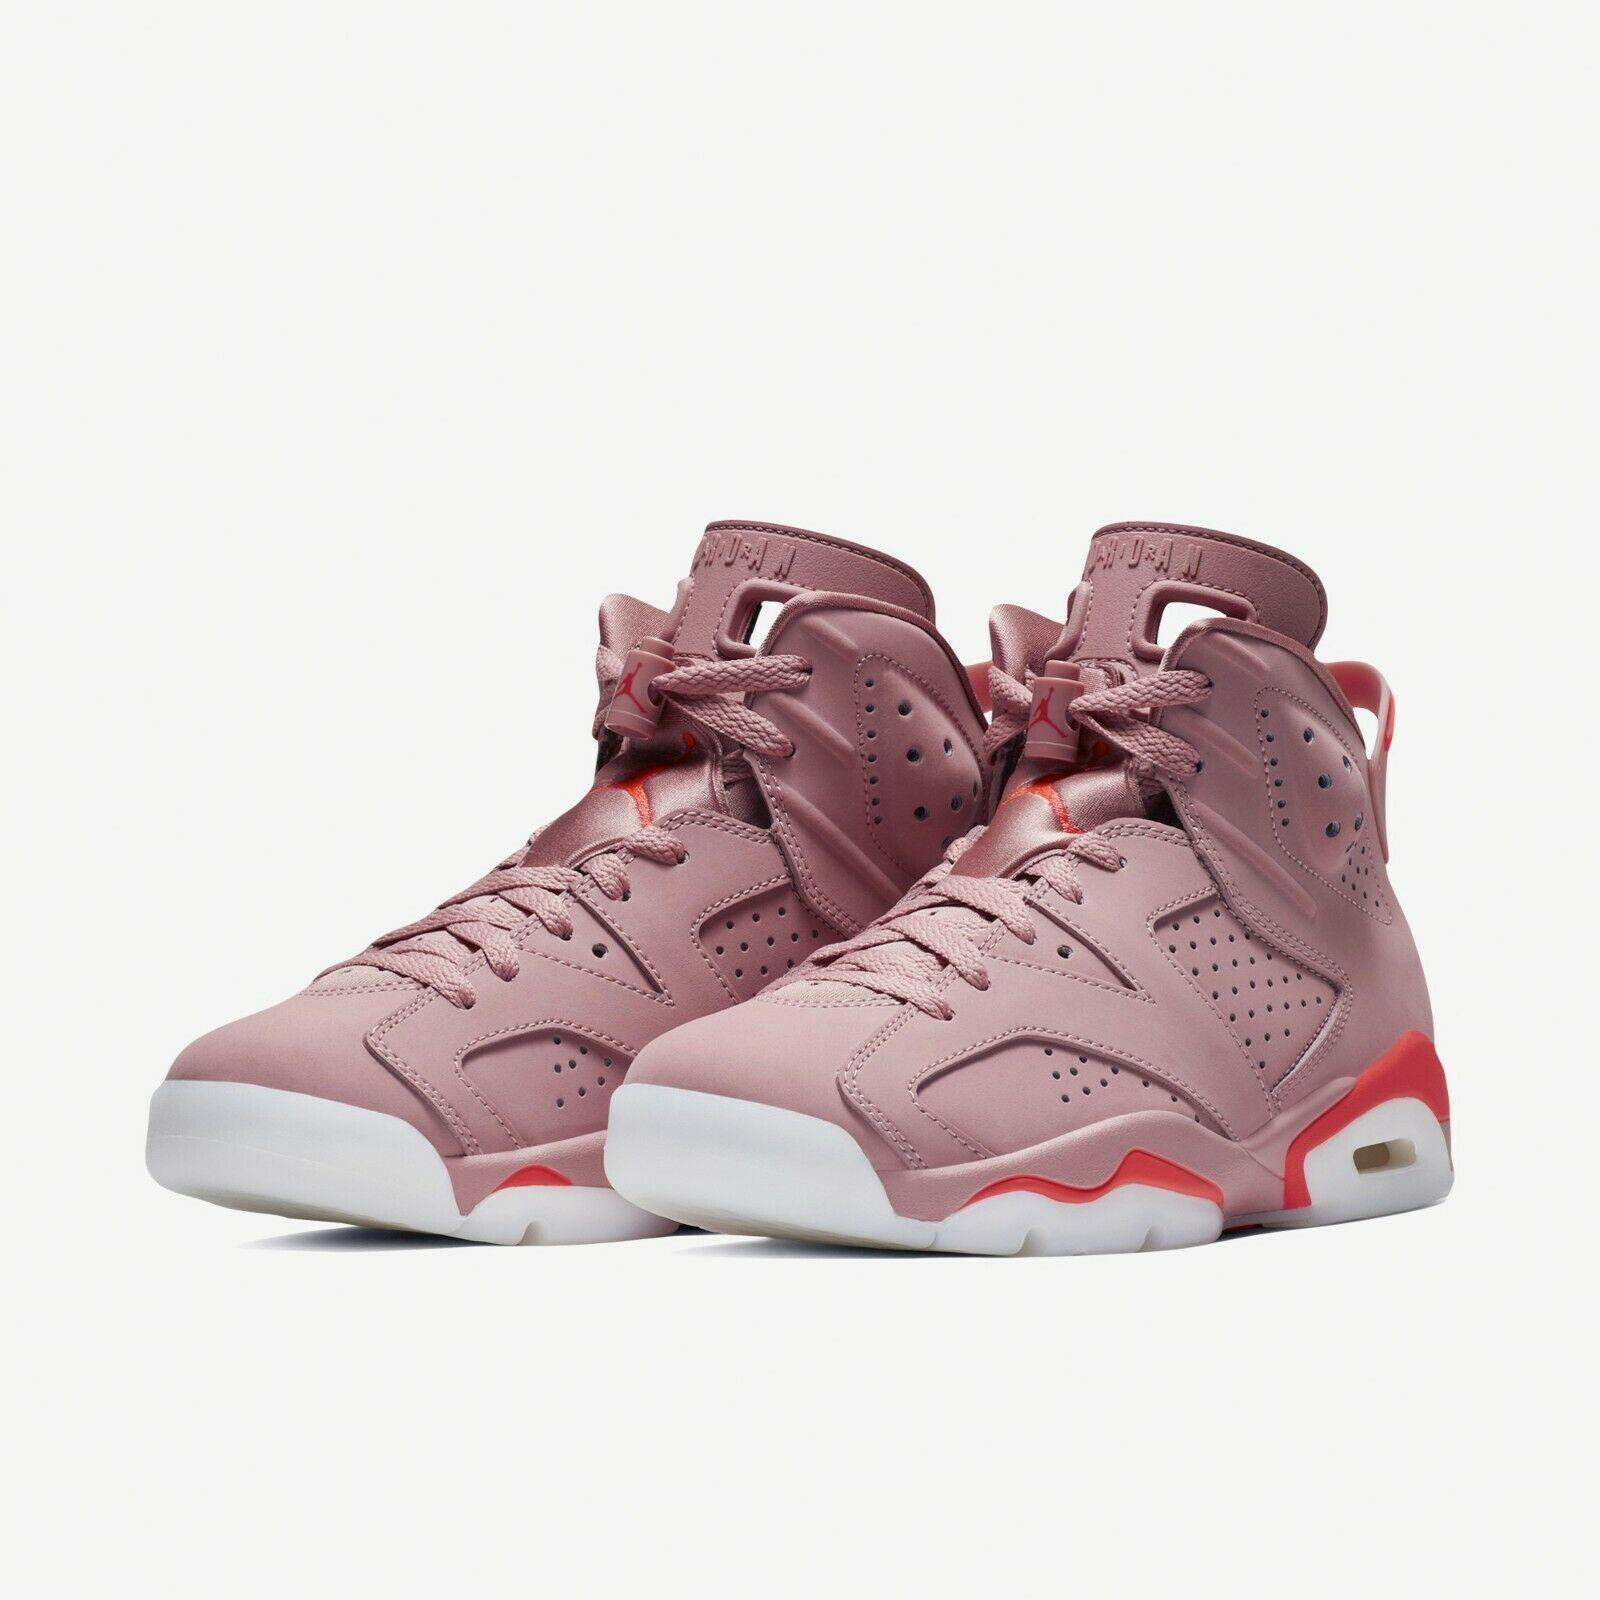 397ecea76d7 Air Jordan 6 Aleali May Rust Pink CI0550-600| Limited & Buy It now ...